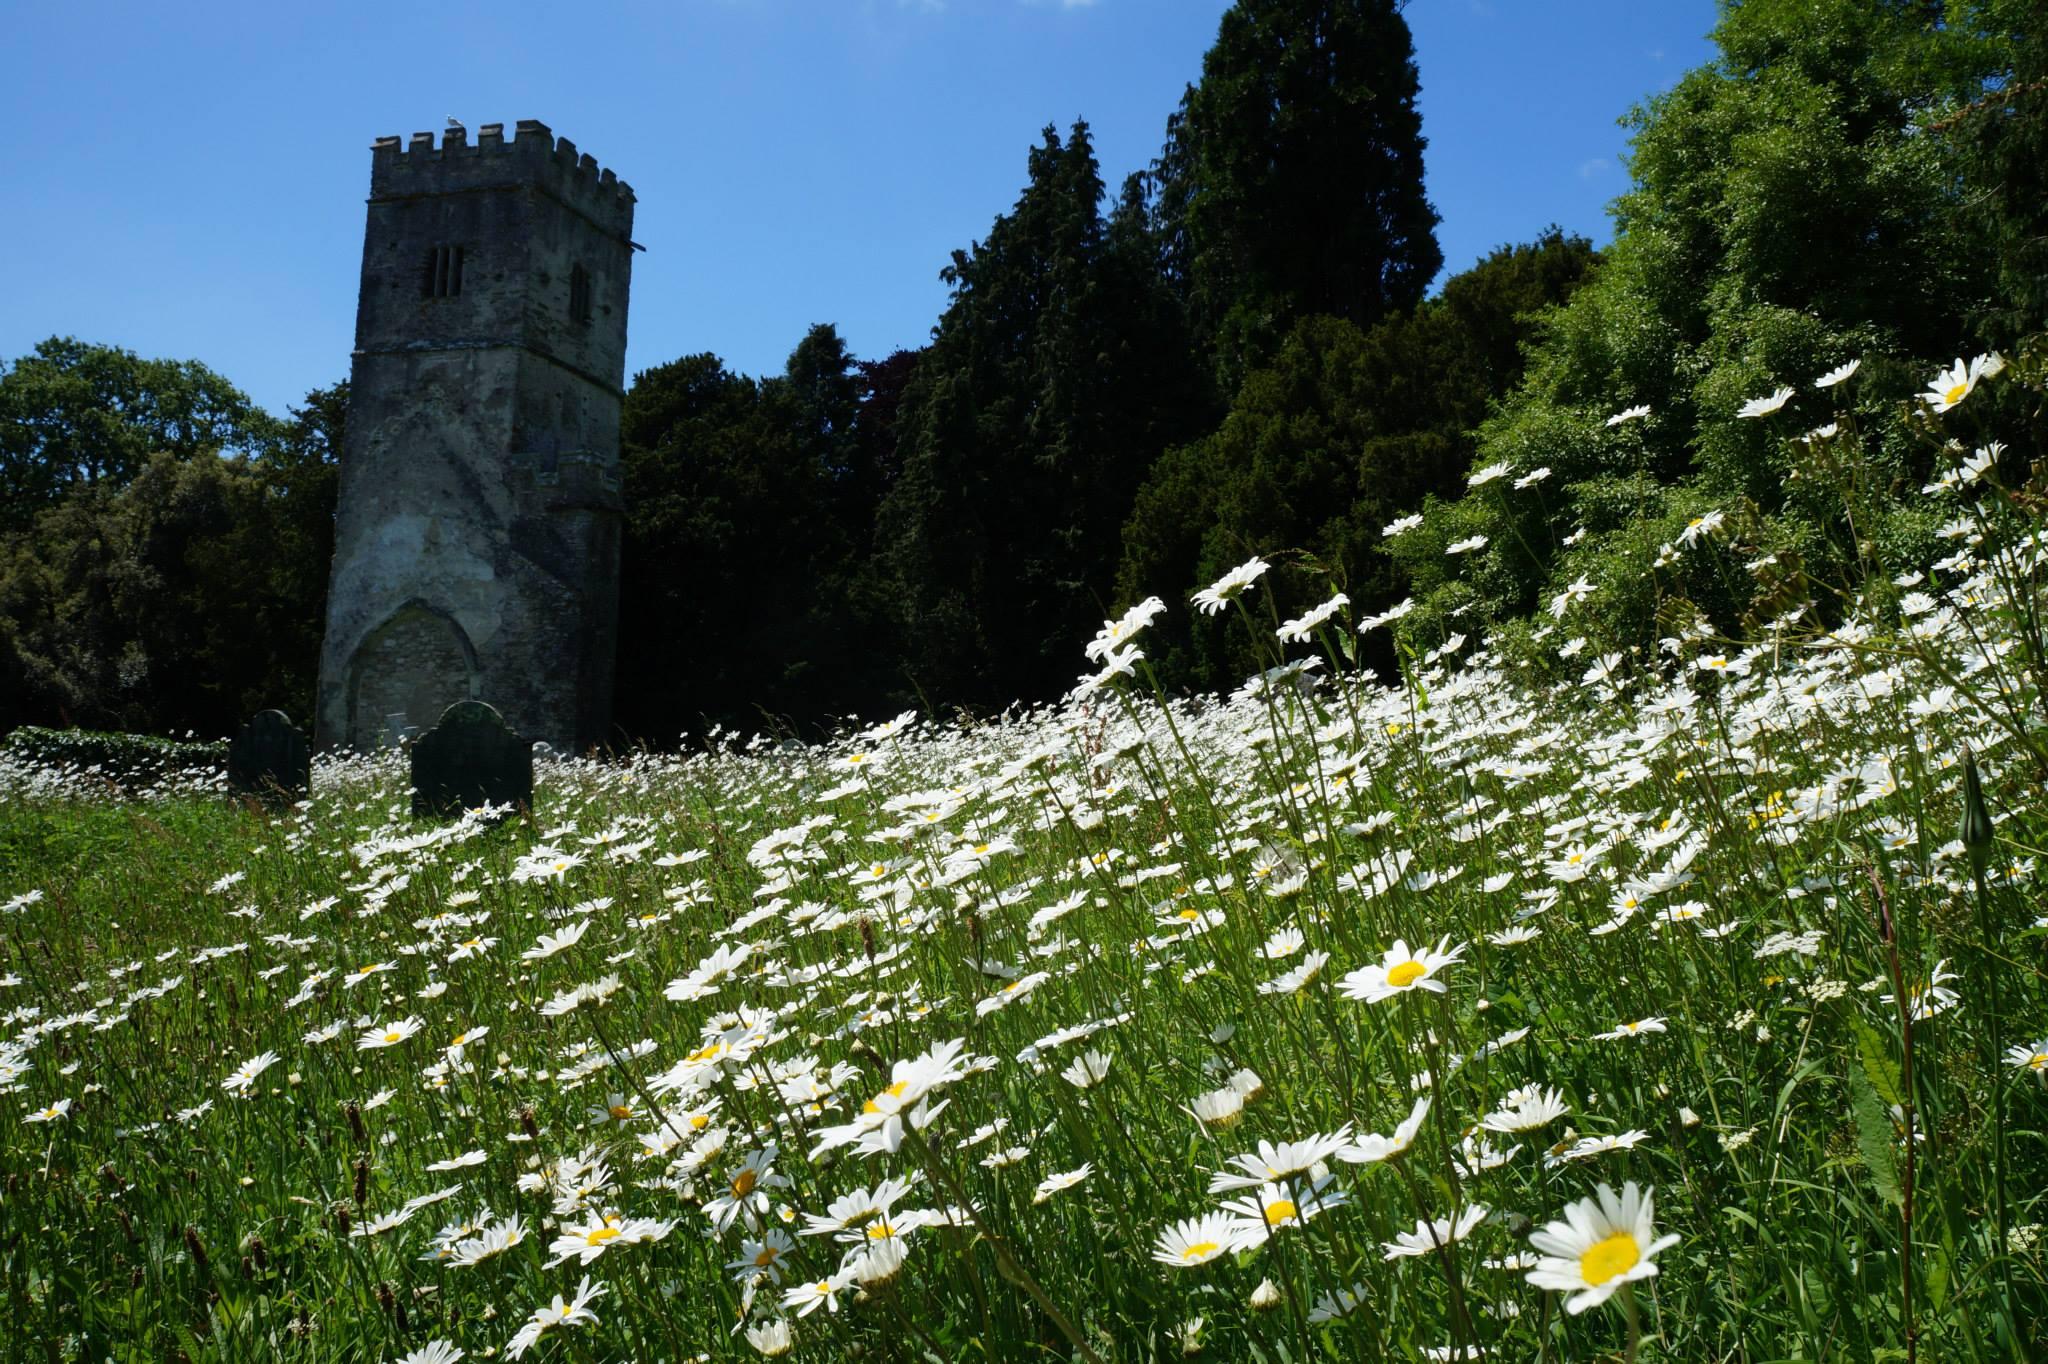 Daisies near St Mary's Church Tower, June 15